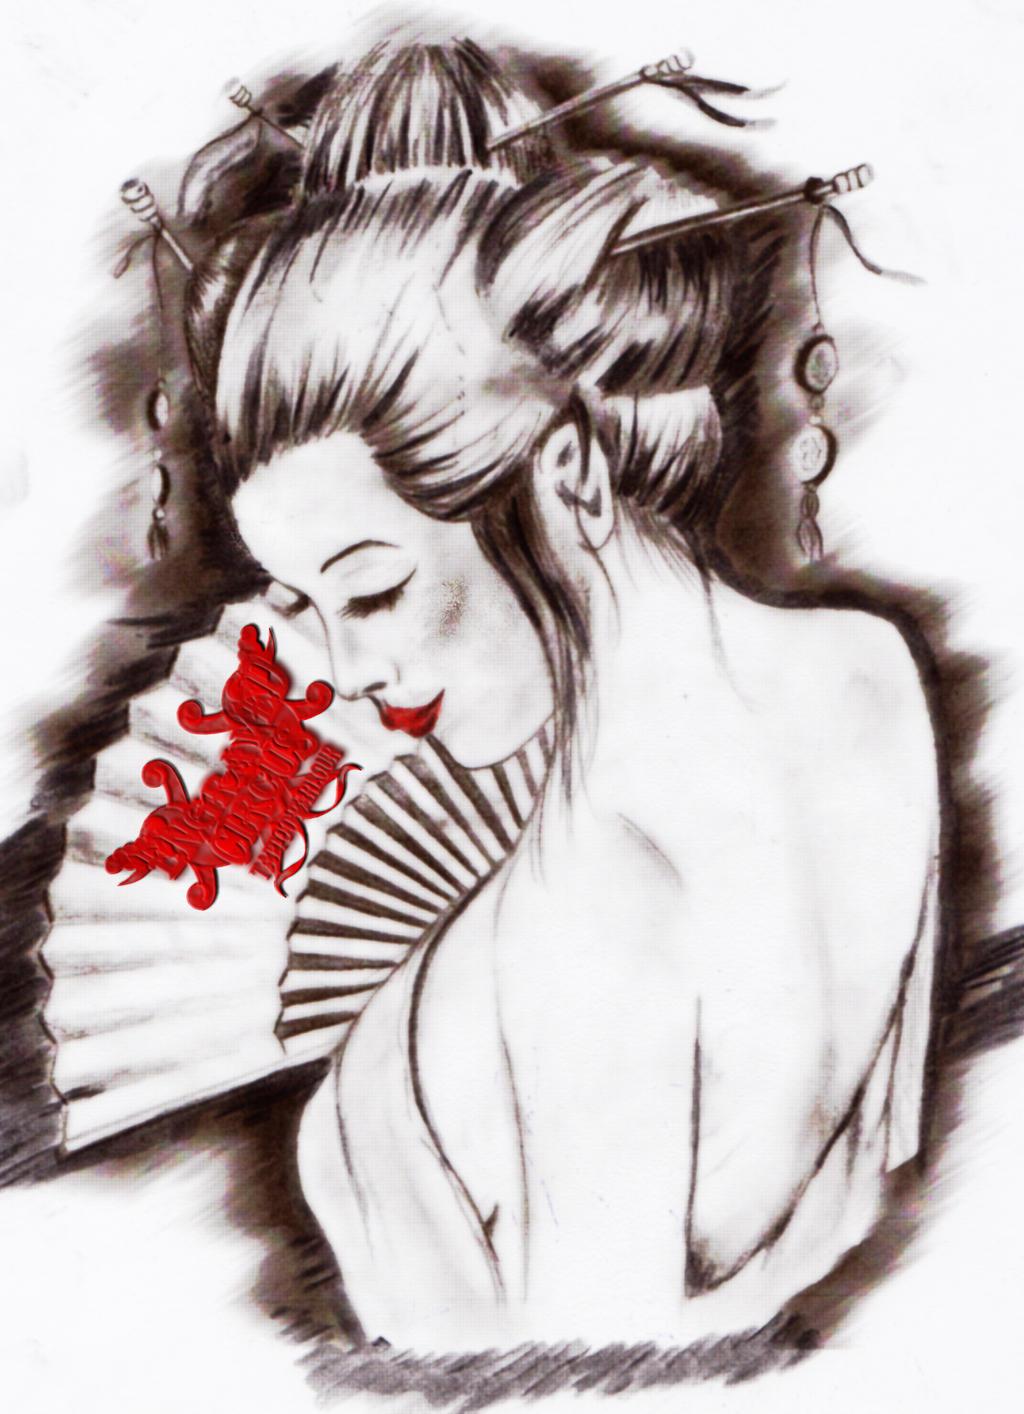 Geisha PtII By Loop1974 On DeviantArt